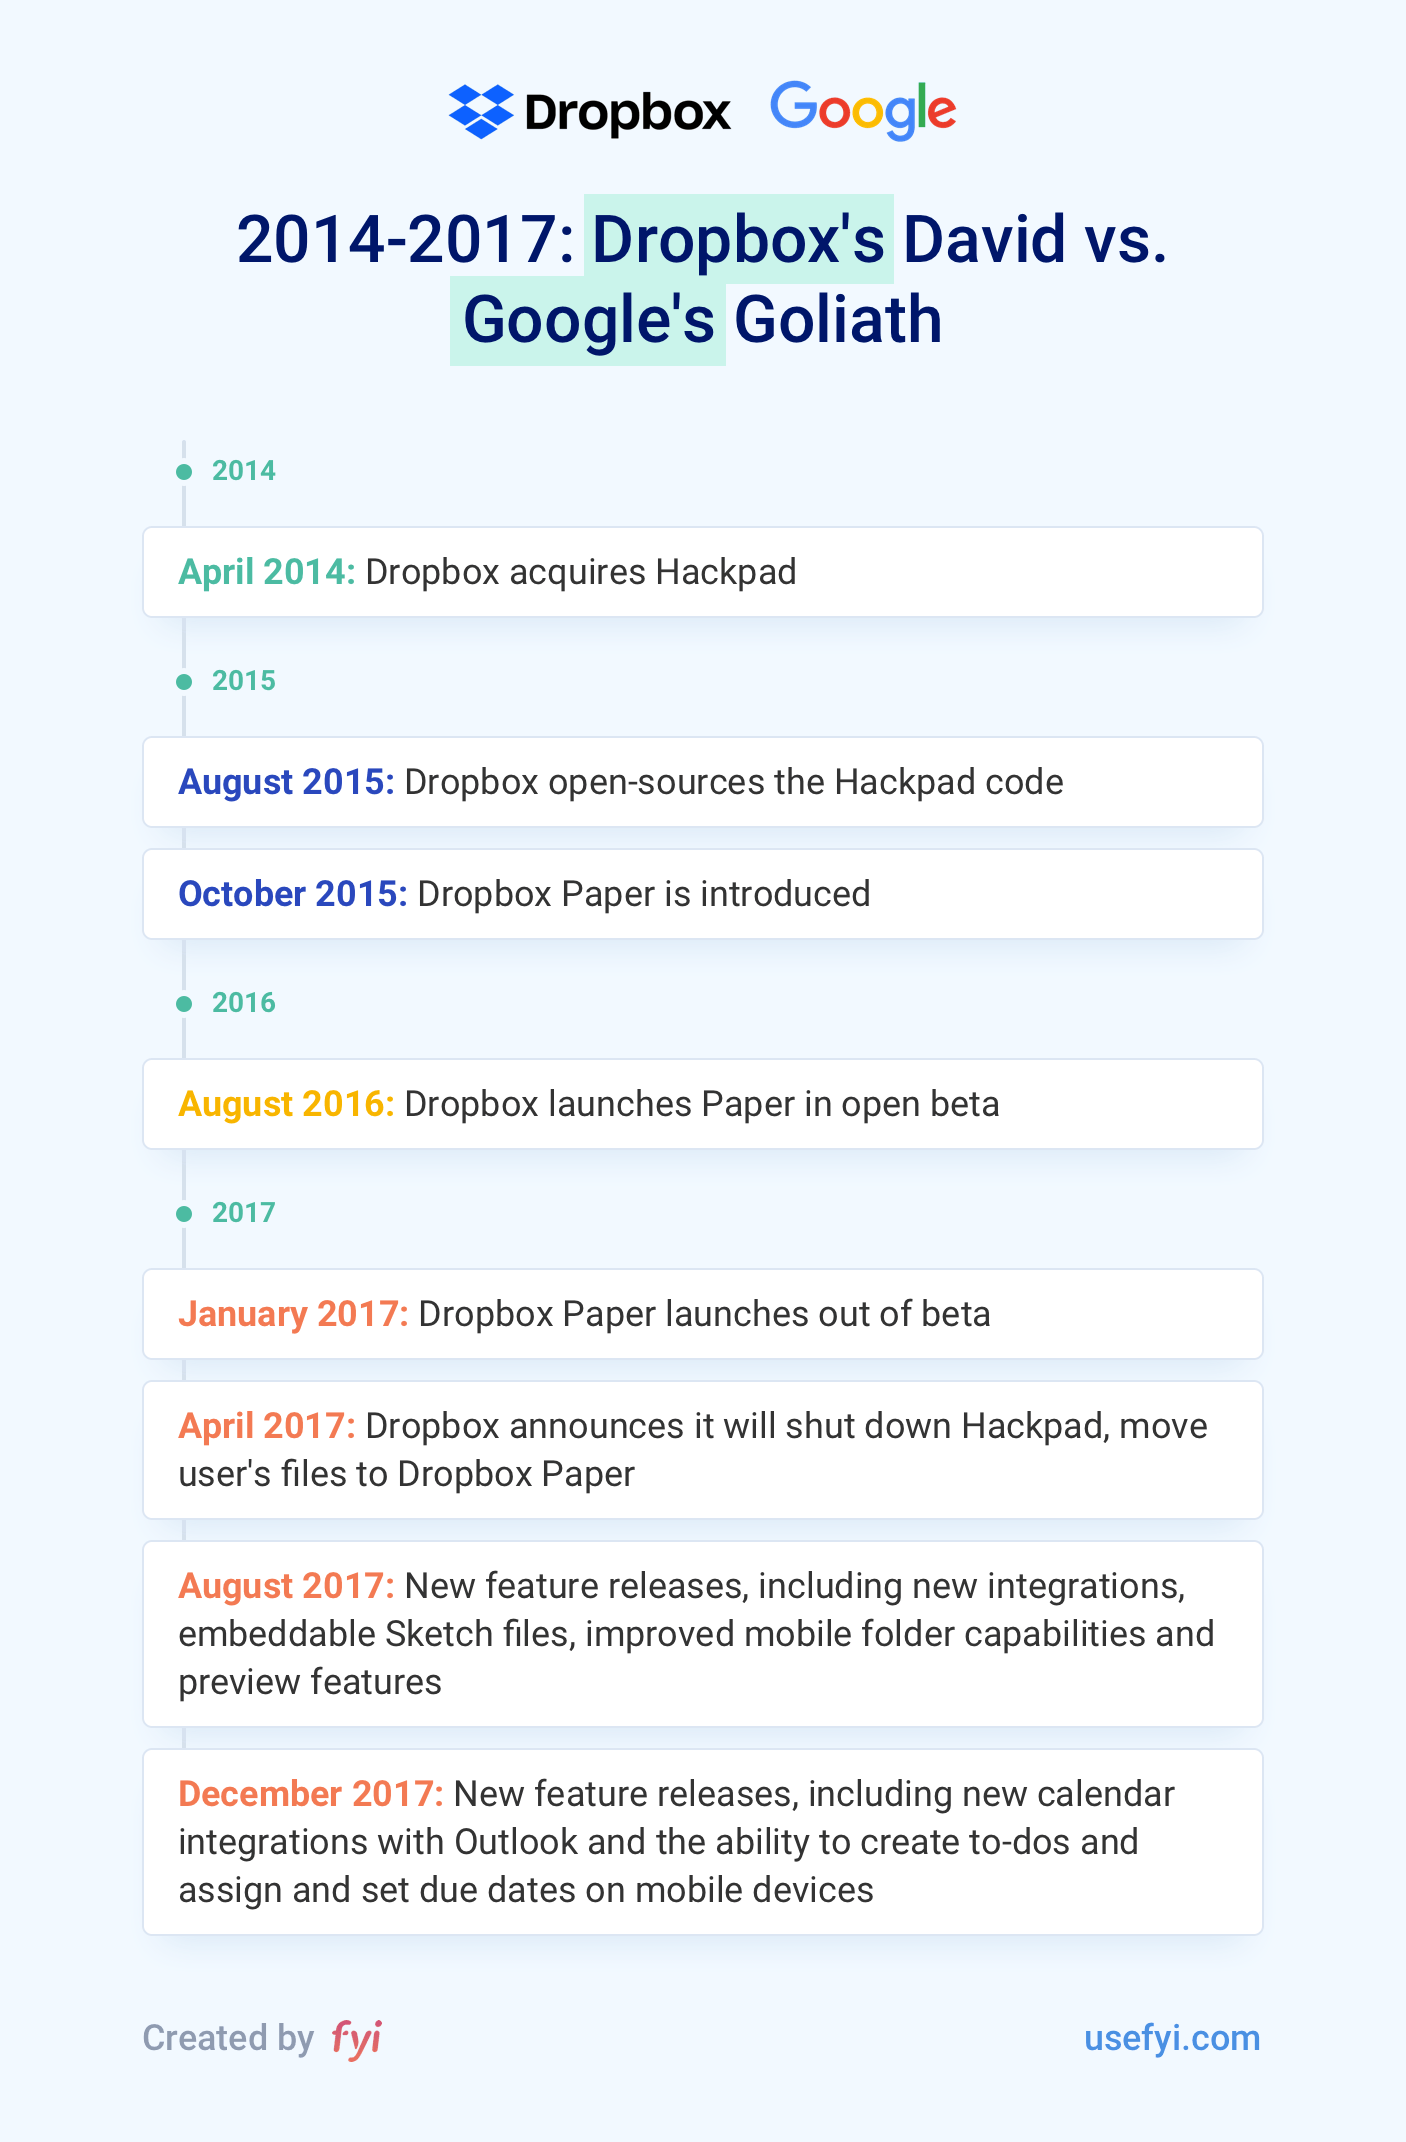 2014-2017 Dropbox